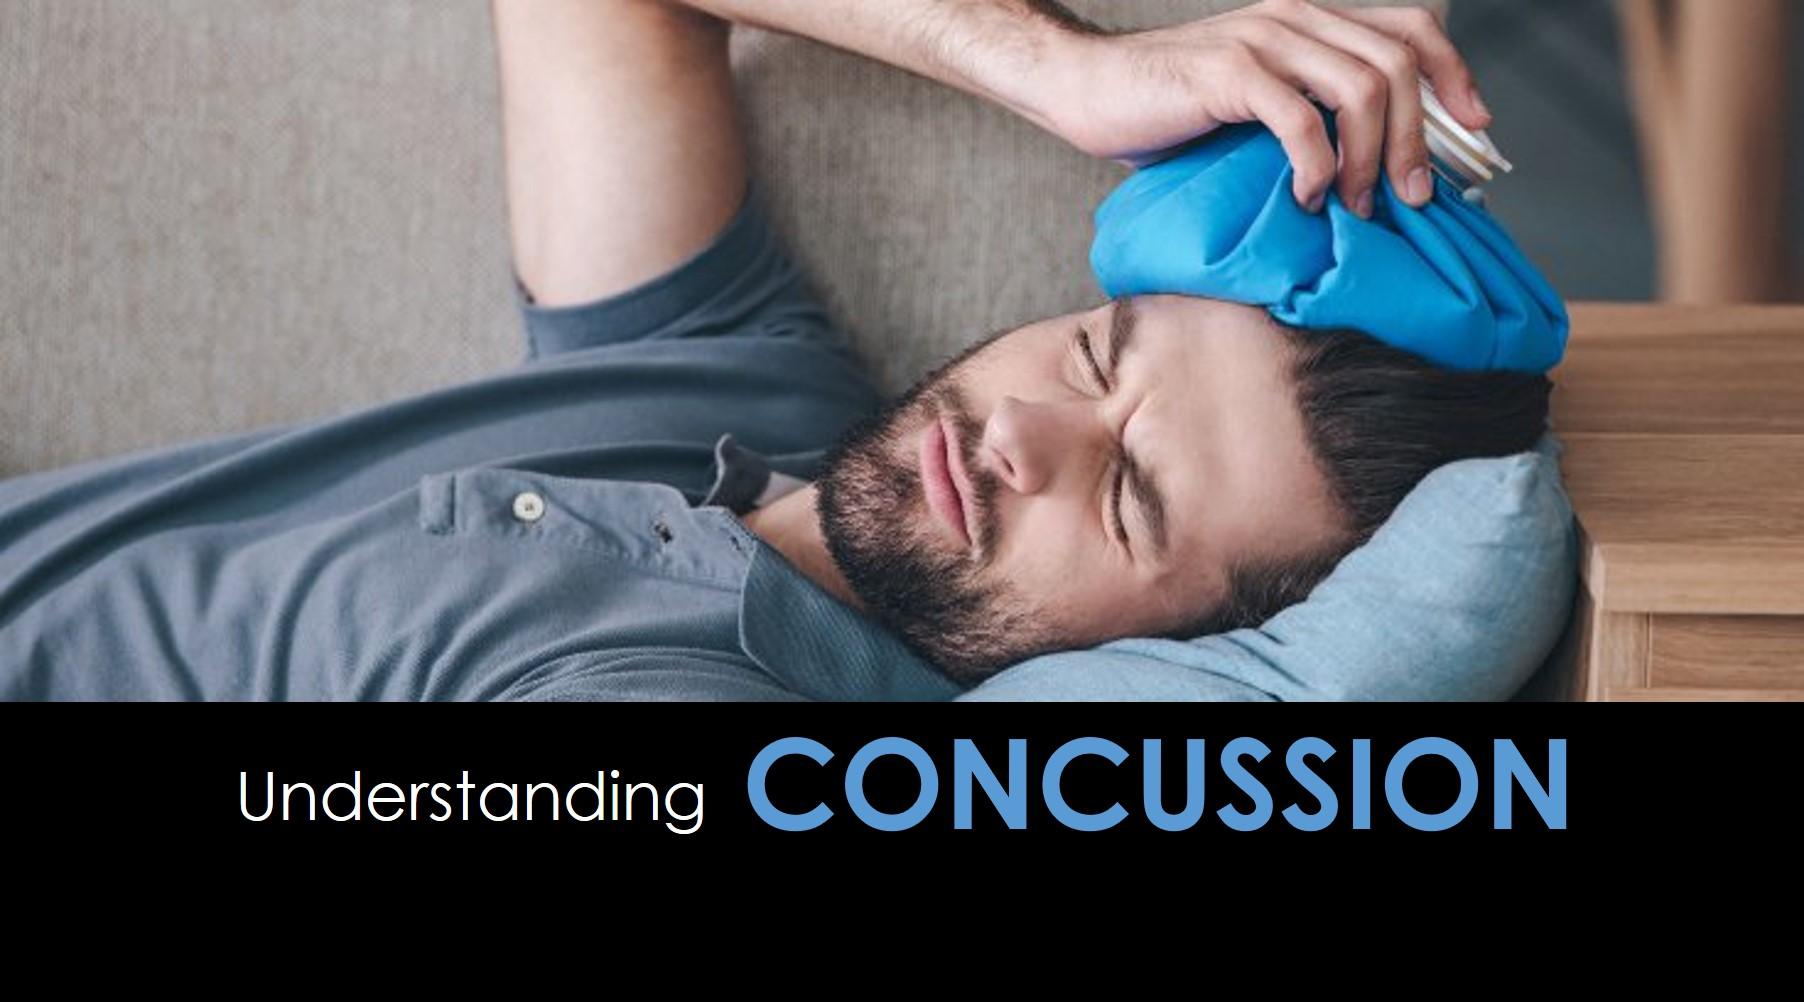 ConcussionMain